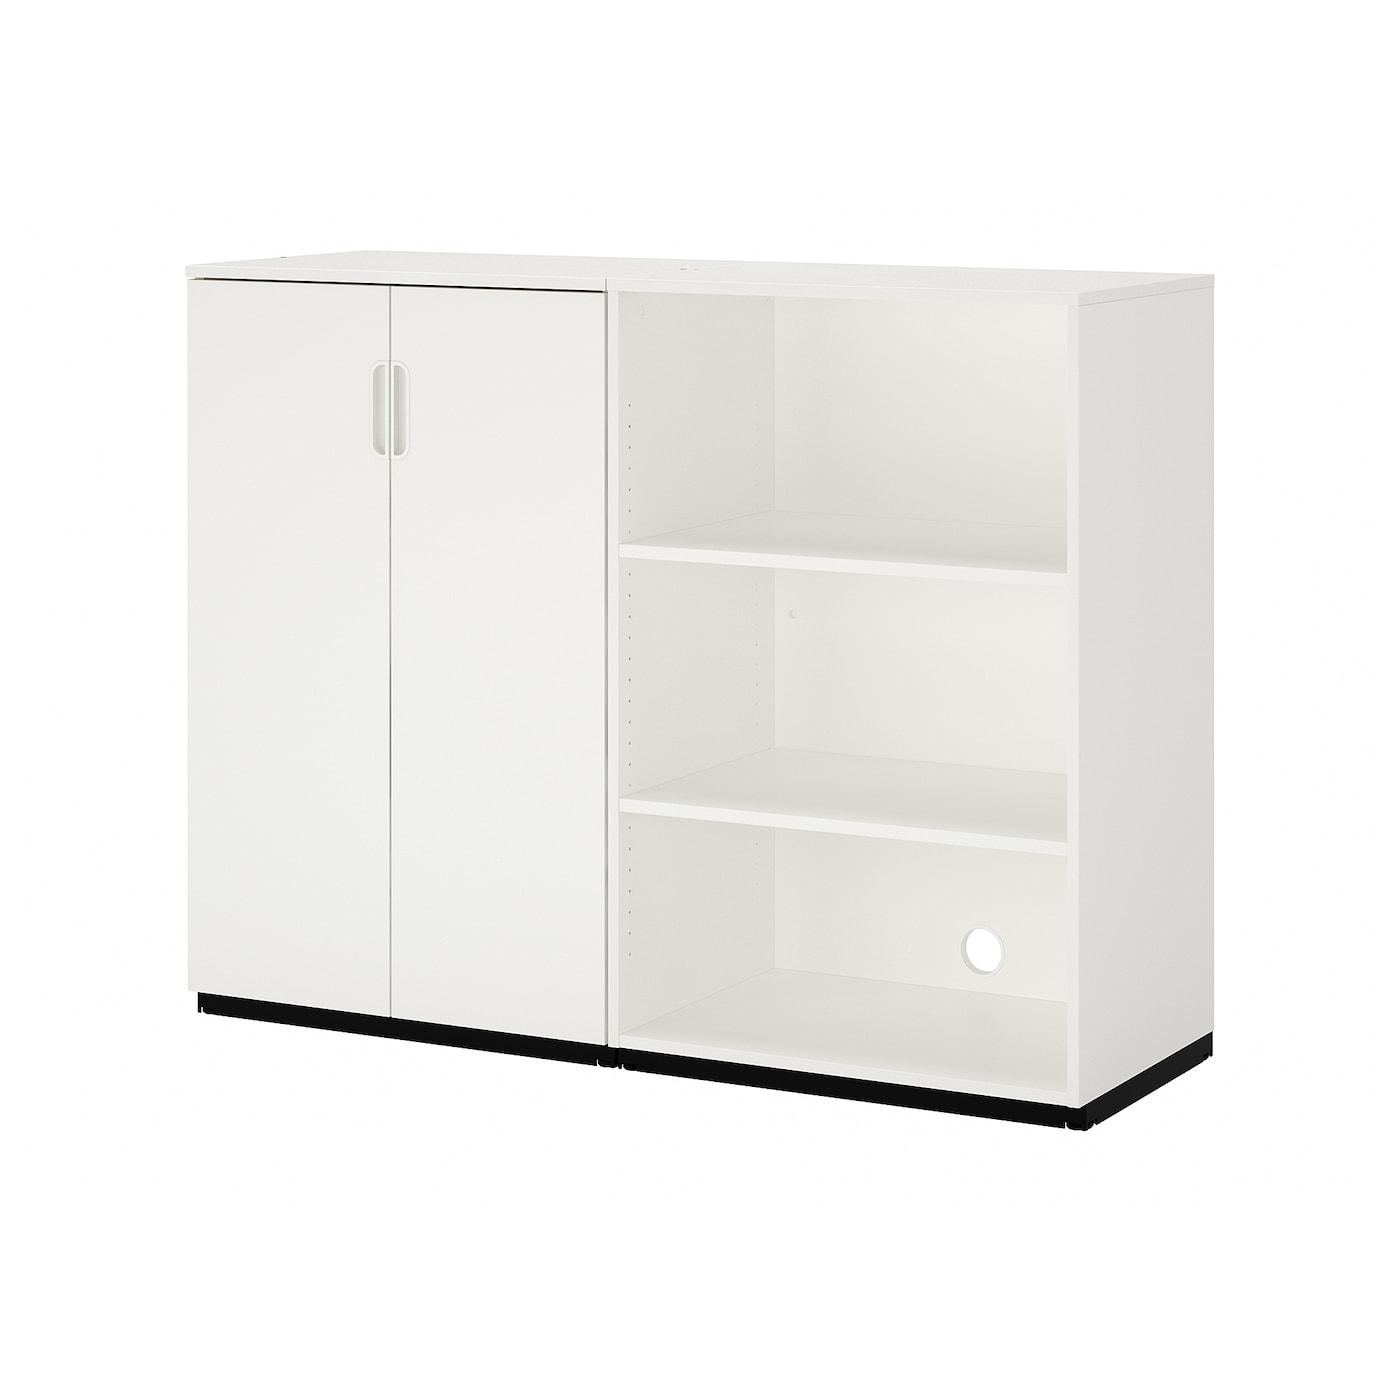 Galant Meuble De Rangement Blanc Ikea